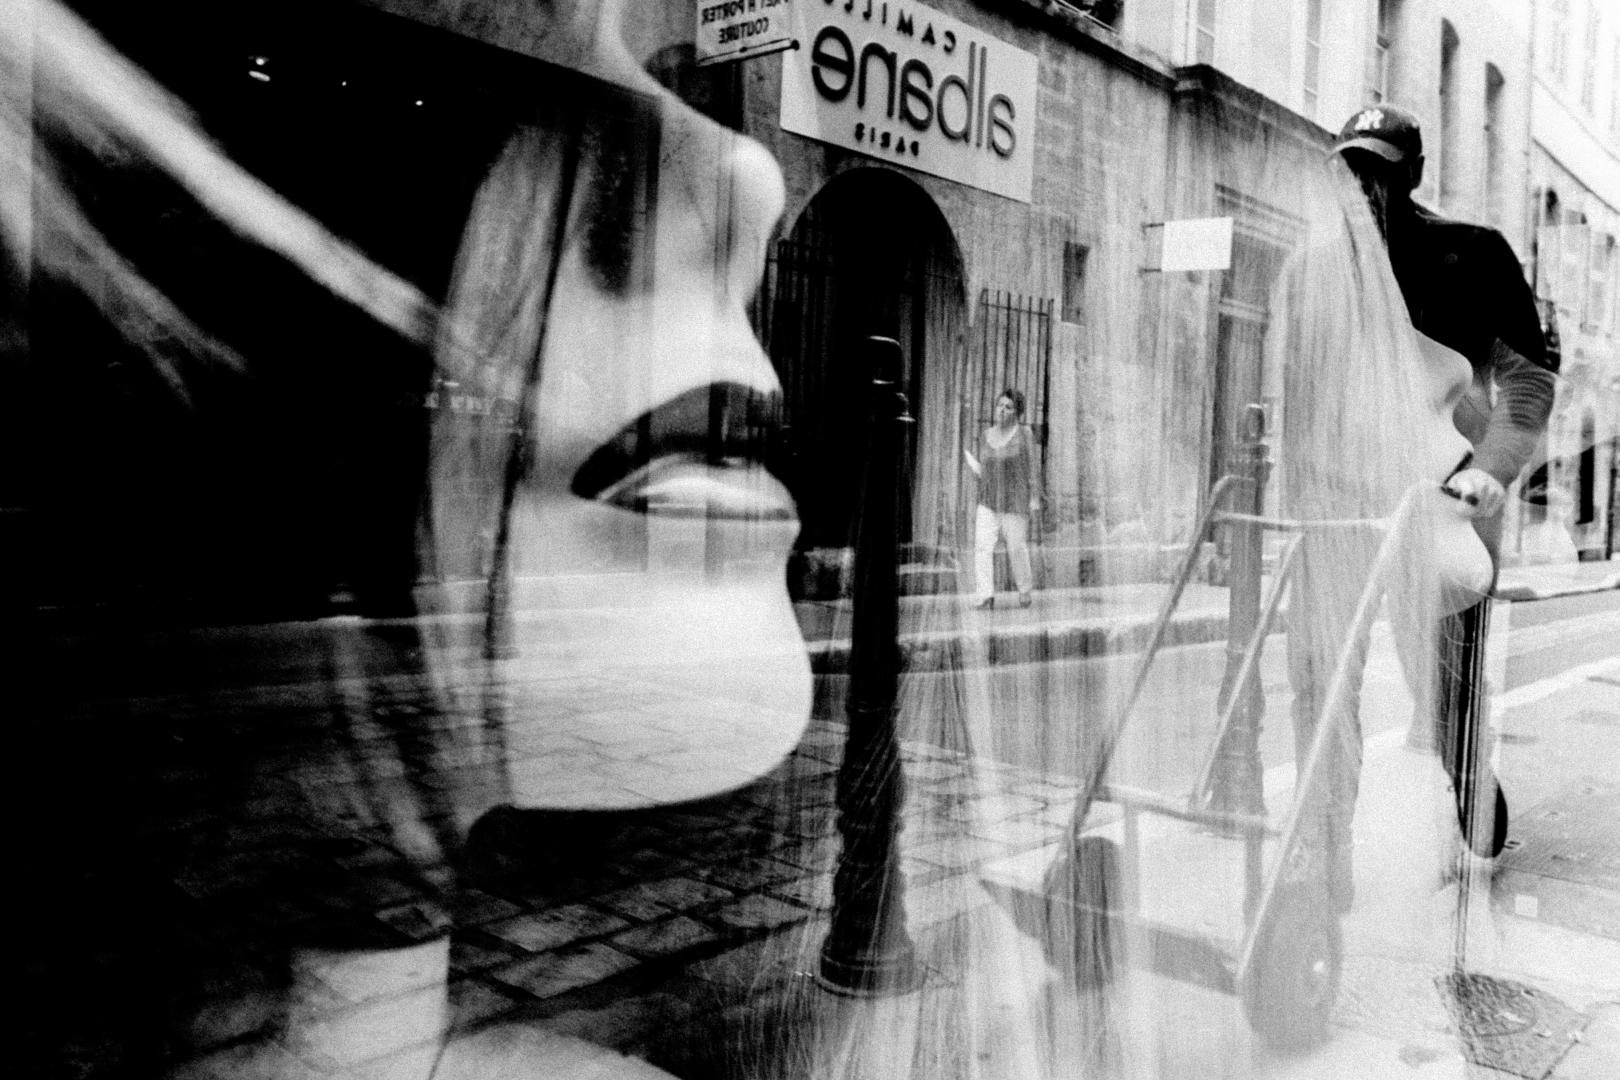 jeff-chane-mouye-street-photography-Aix-en-Provence-201